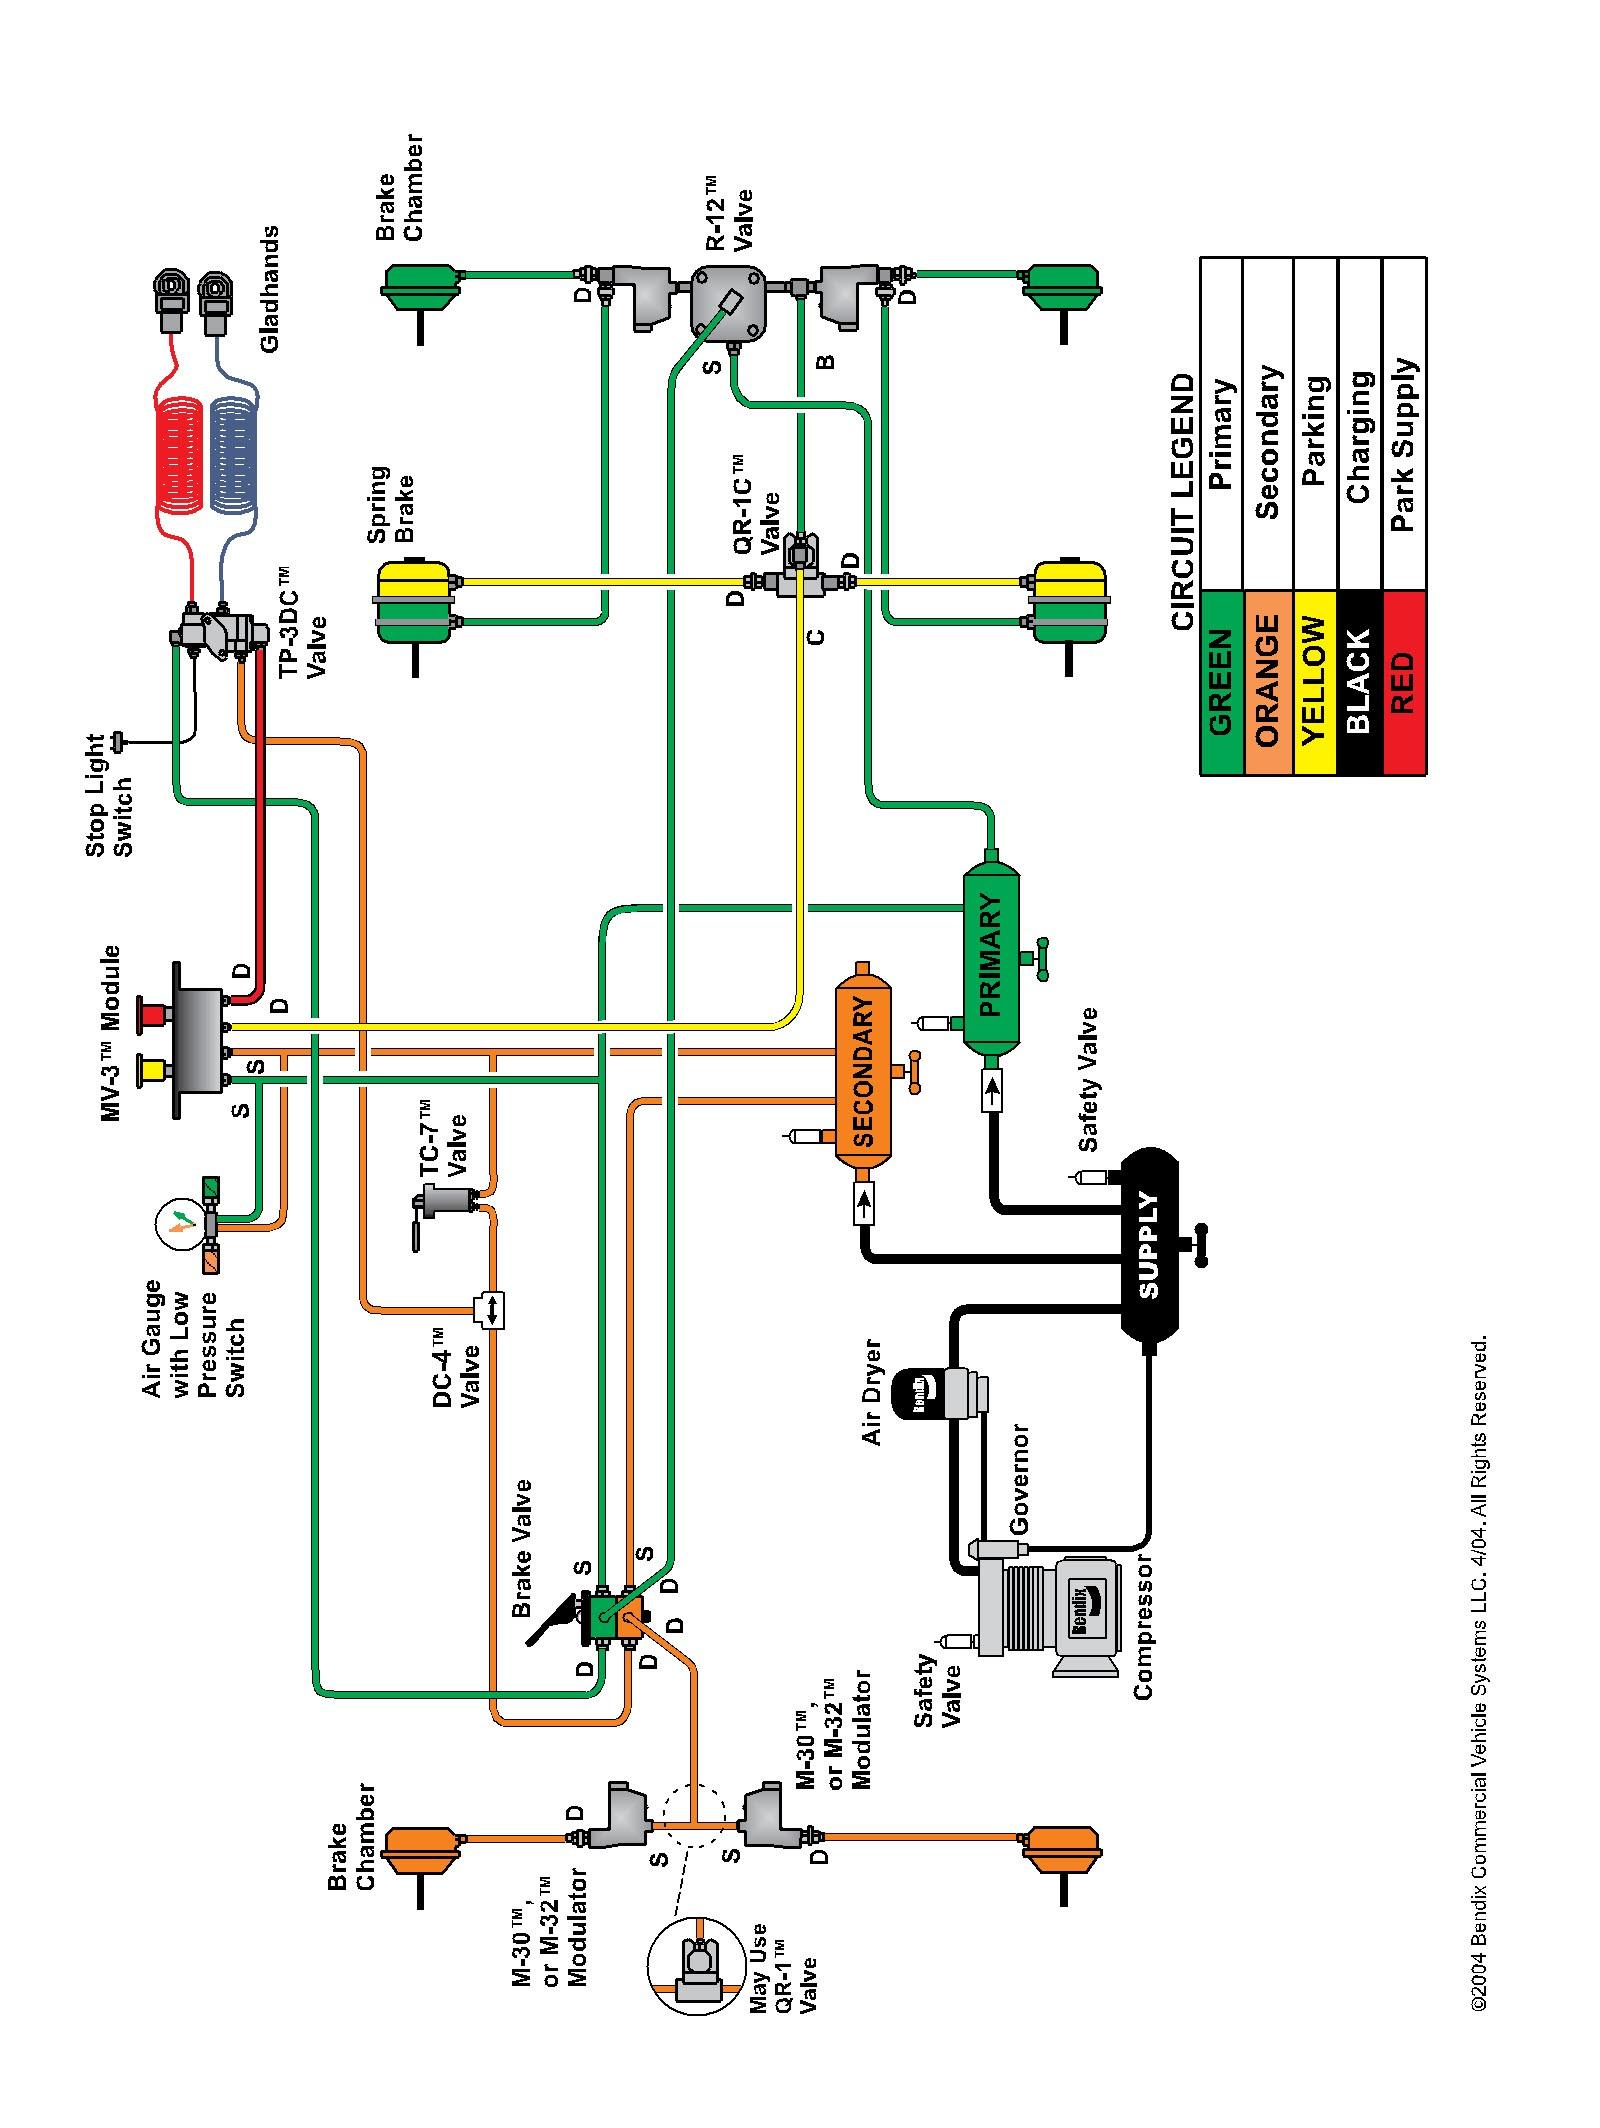 Air Brake System Diagram Management Unit Diagrams Besides Freightliner M2 Amu Wiring Of Air Brake System Diagram